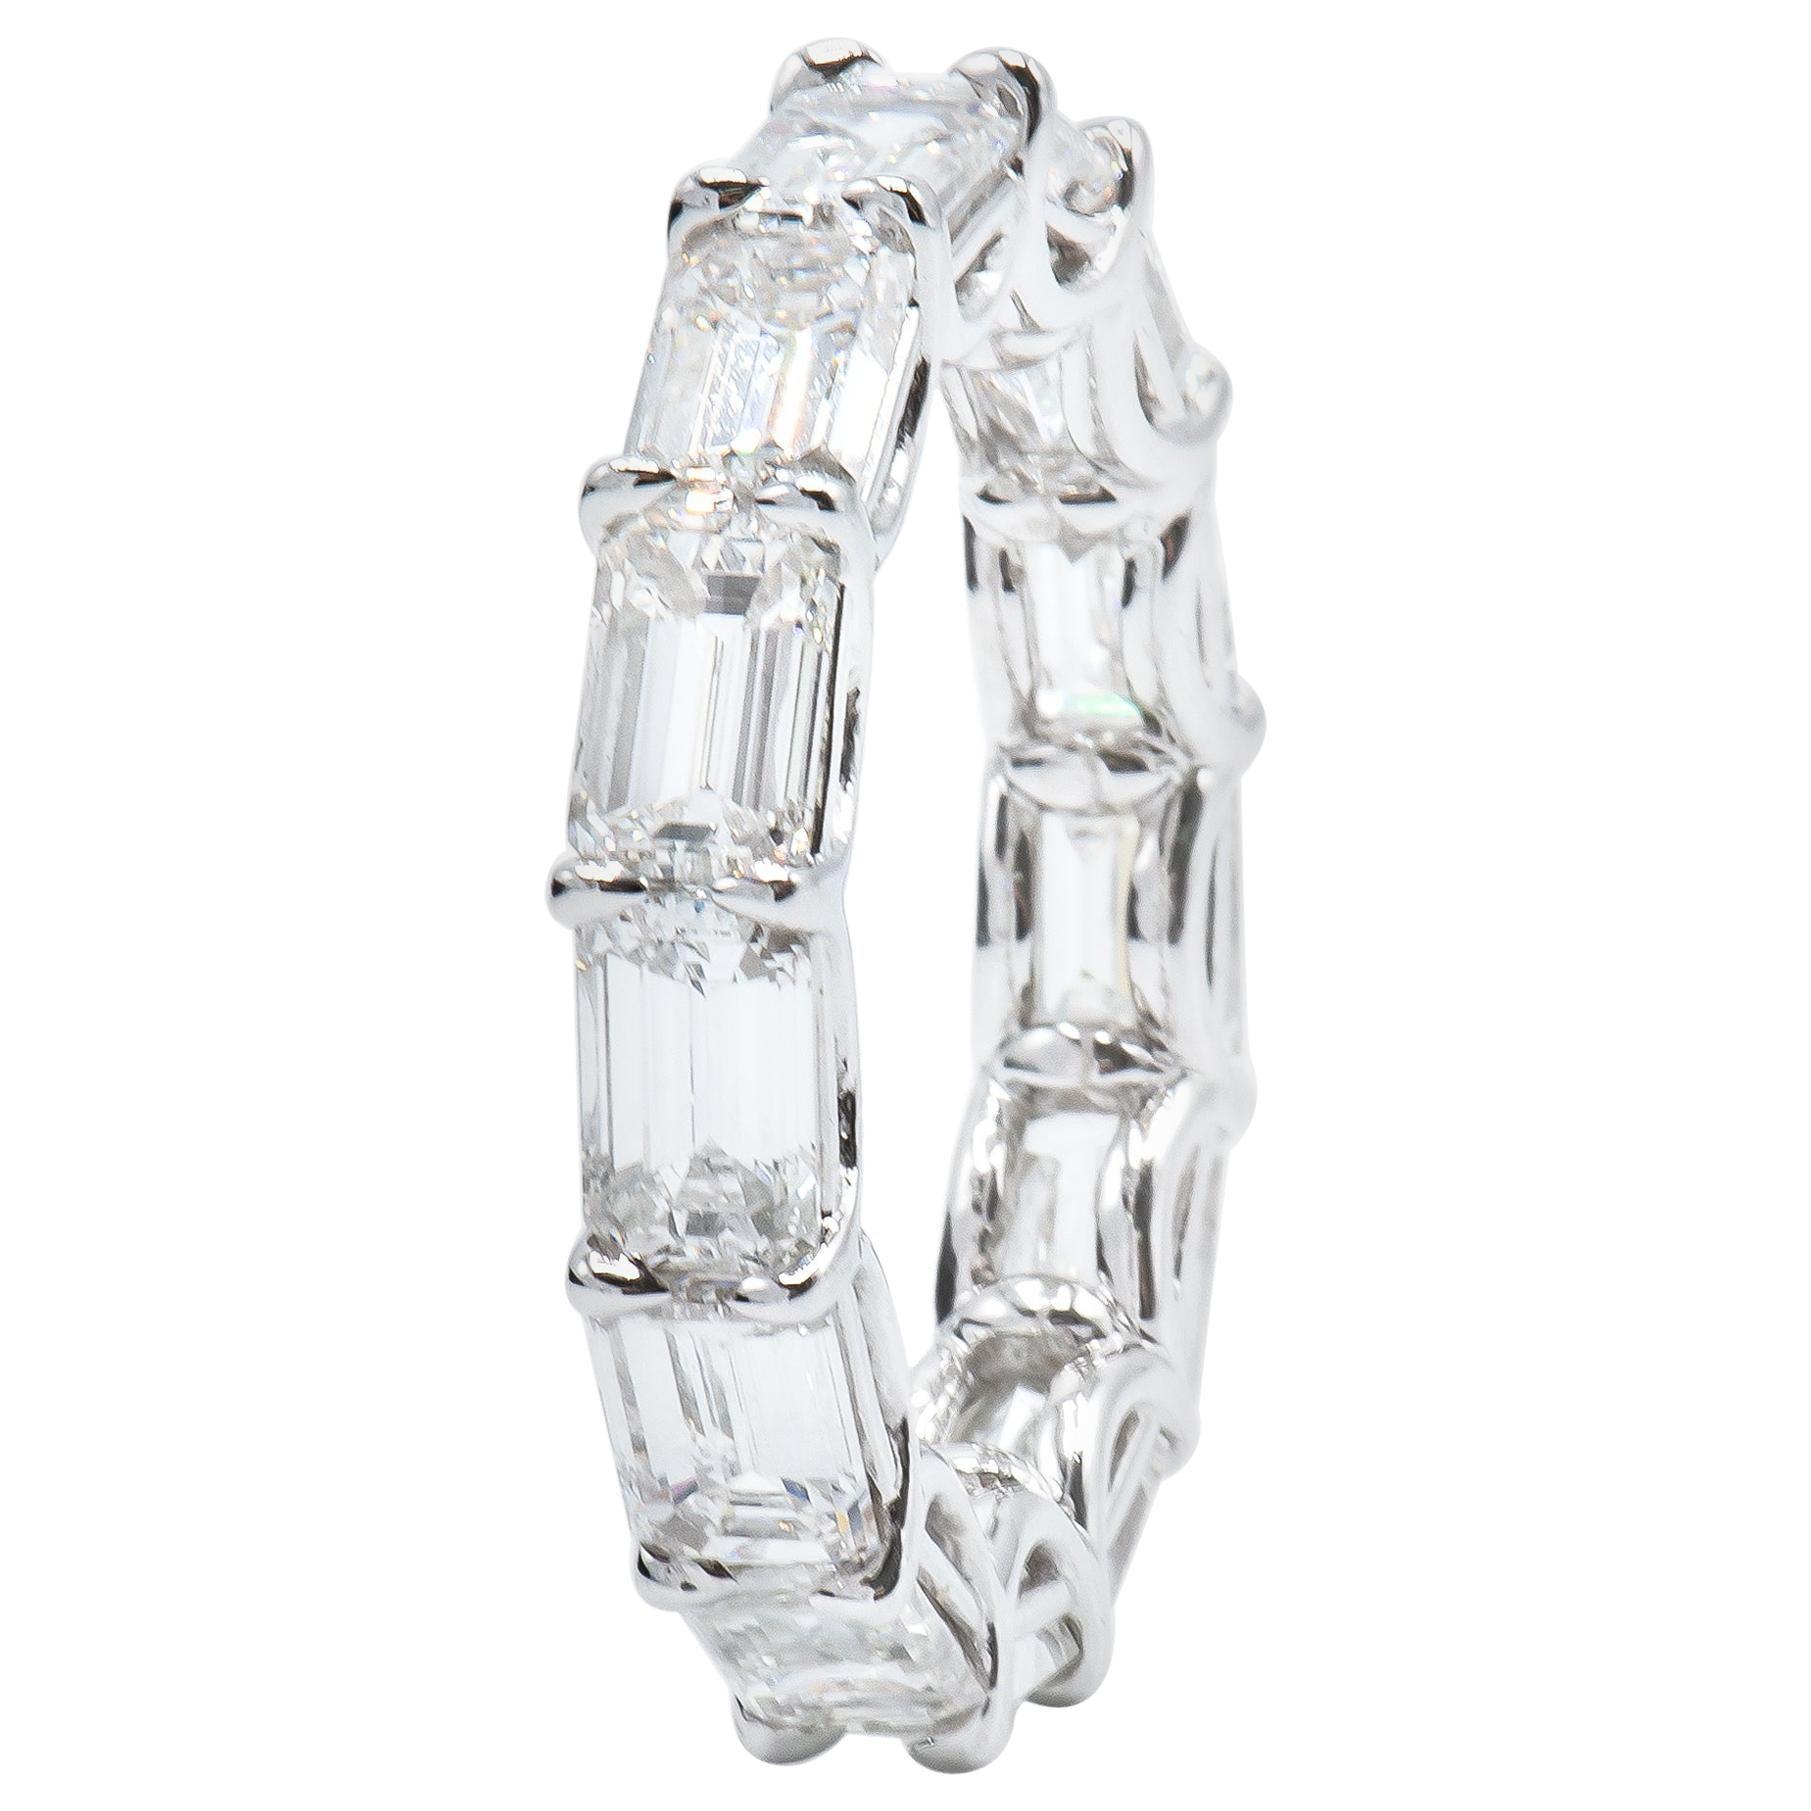 6.54 Carat East West Emerald Cut Diamond Eternity Band Ring